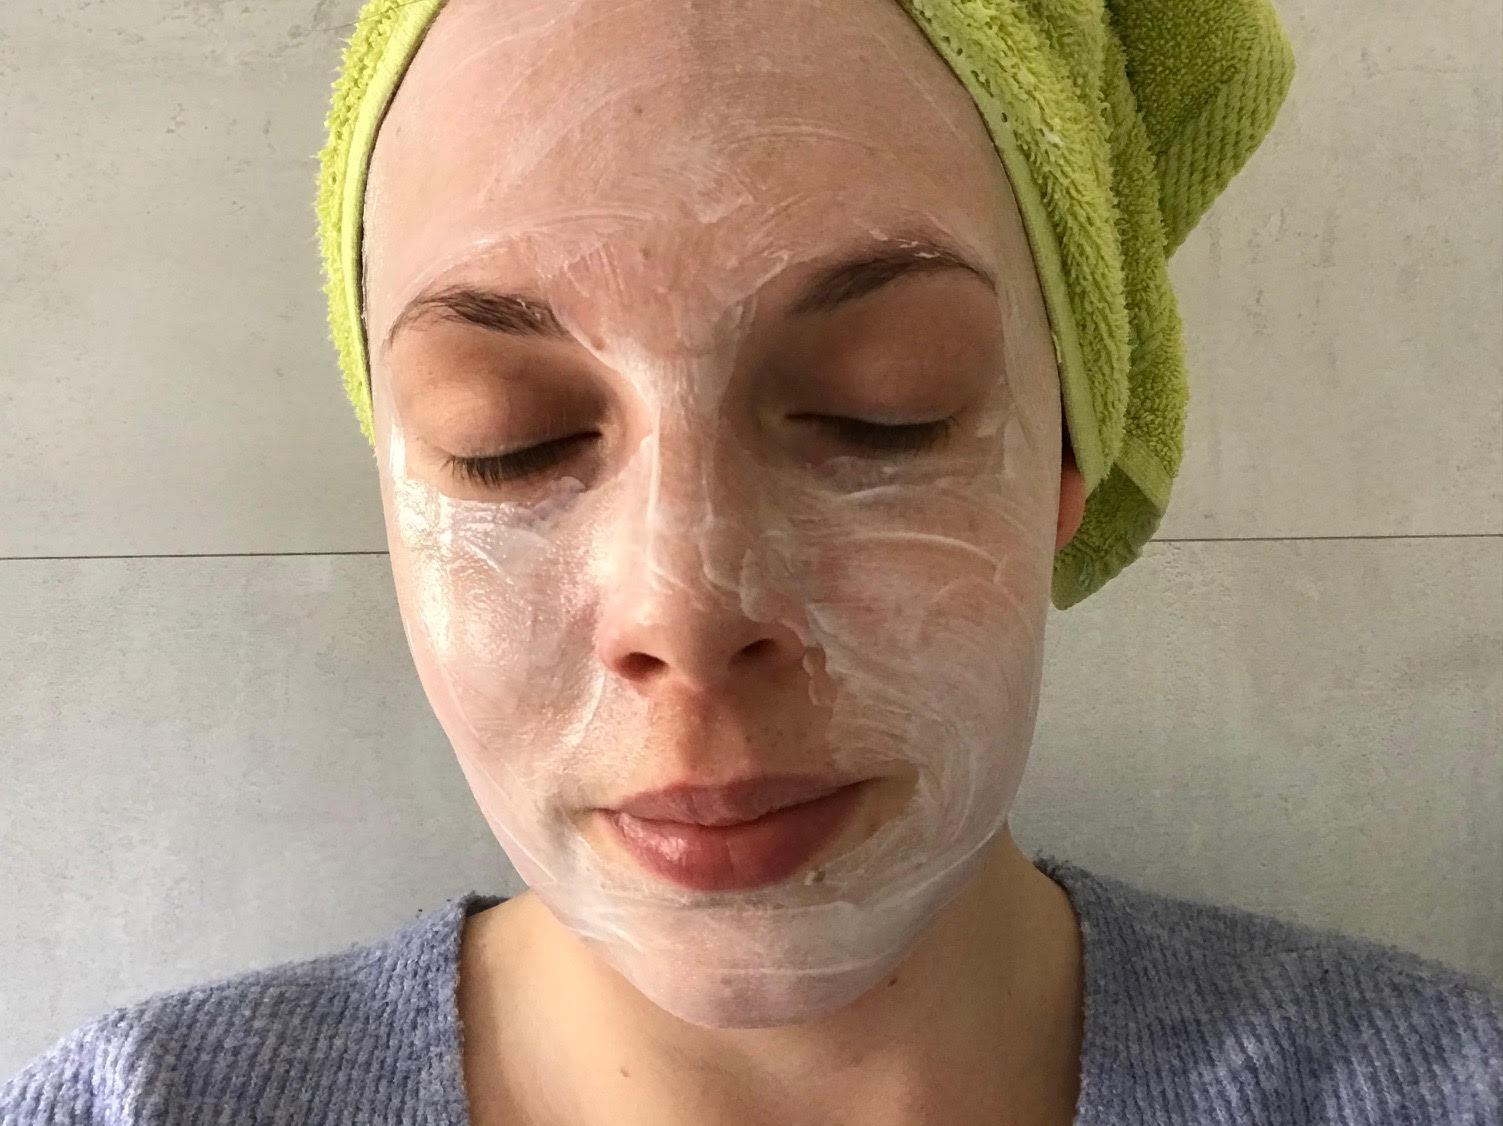 florena hydrating mask 24h